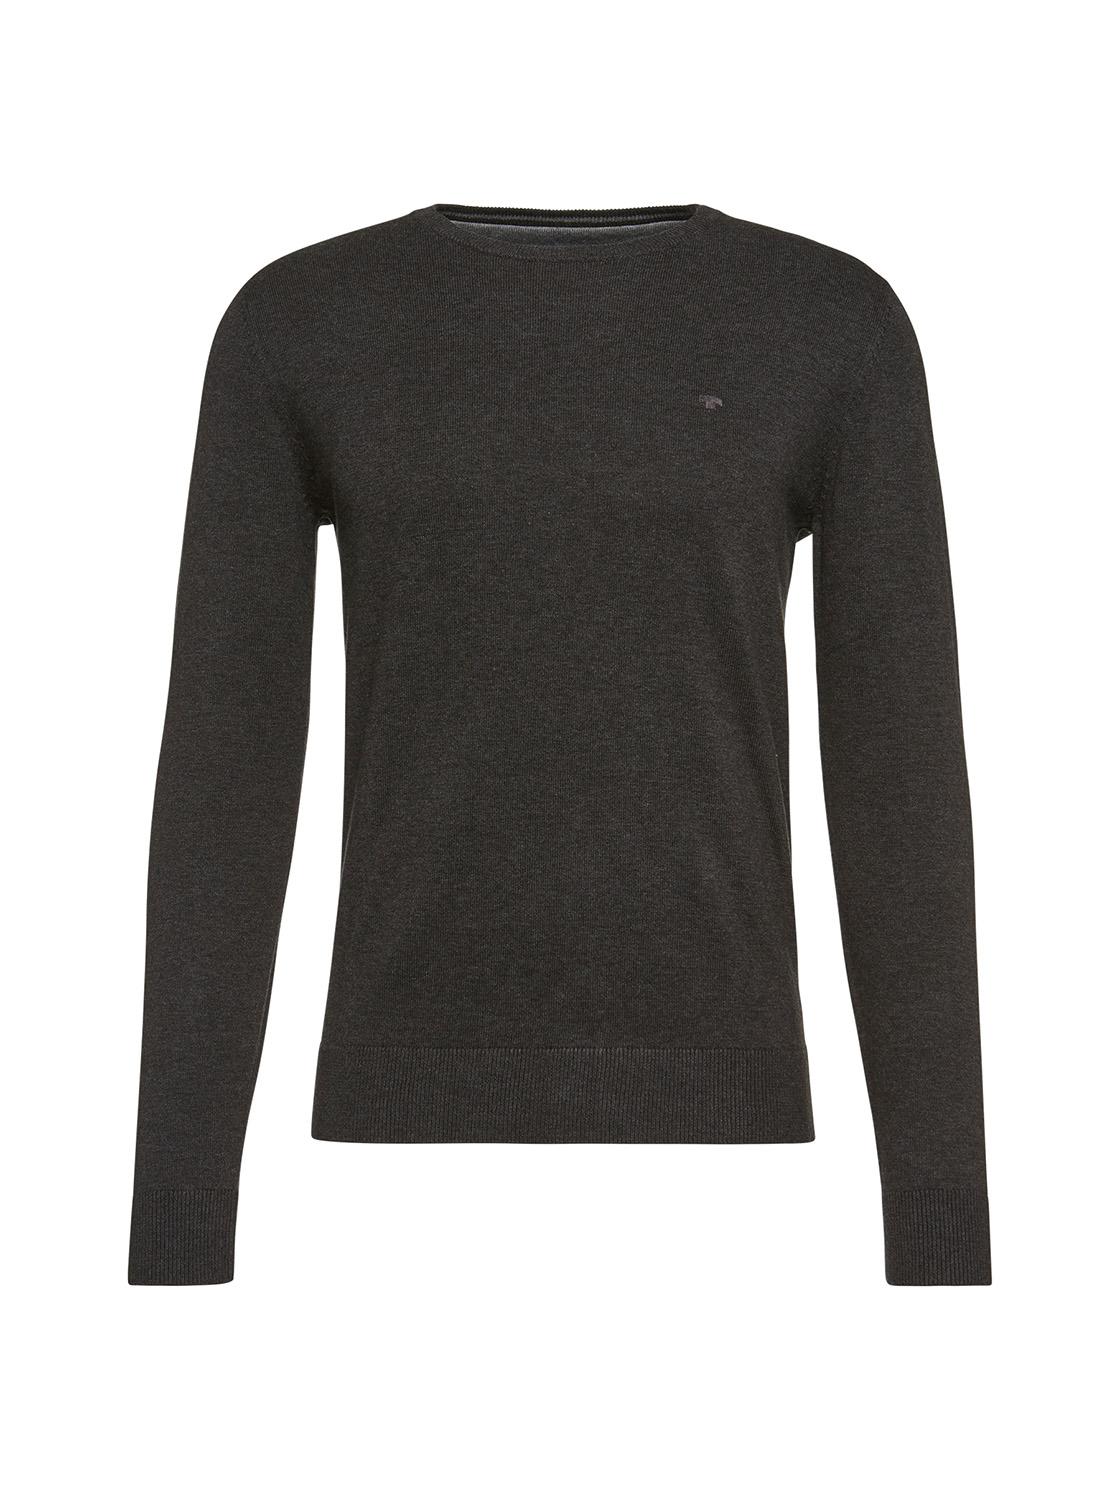 Pullover uni 1/1 crew-neck, black grey melange